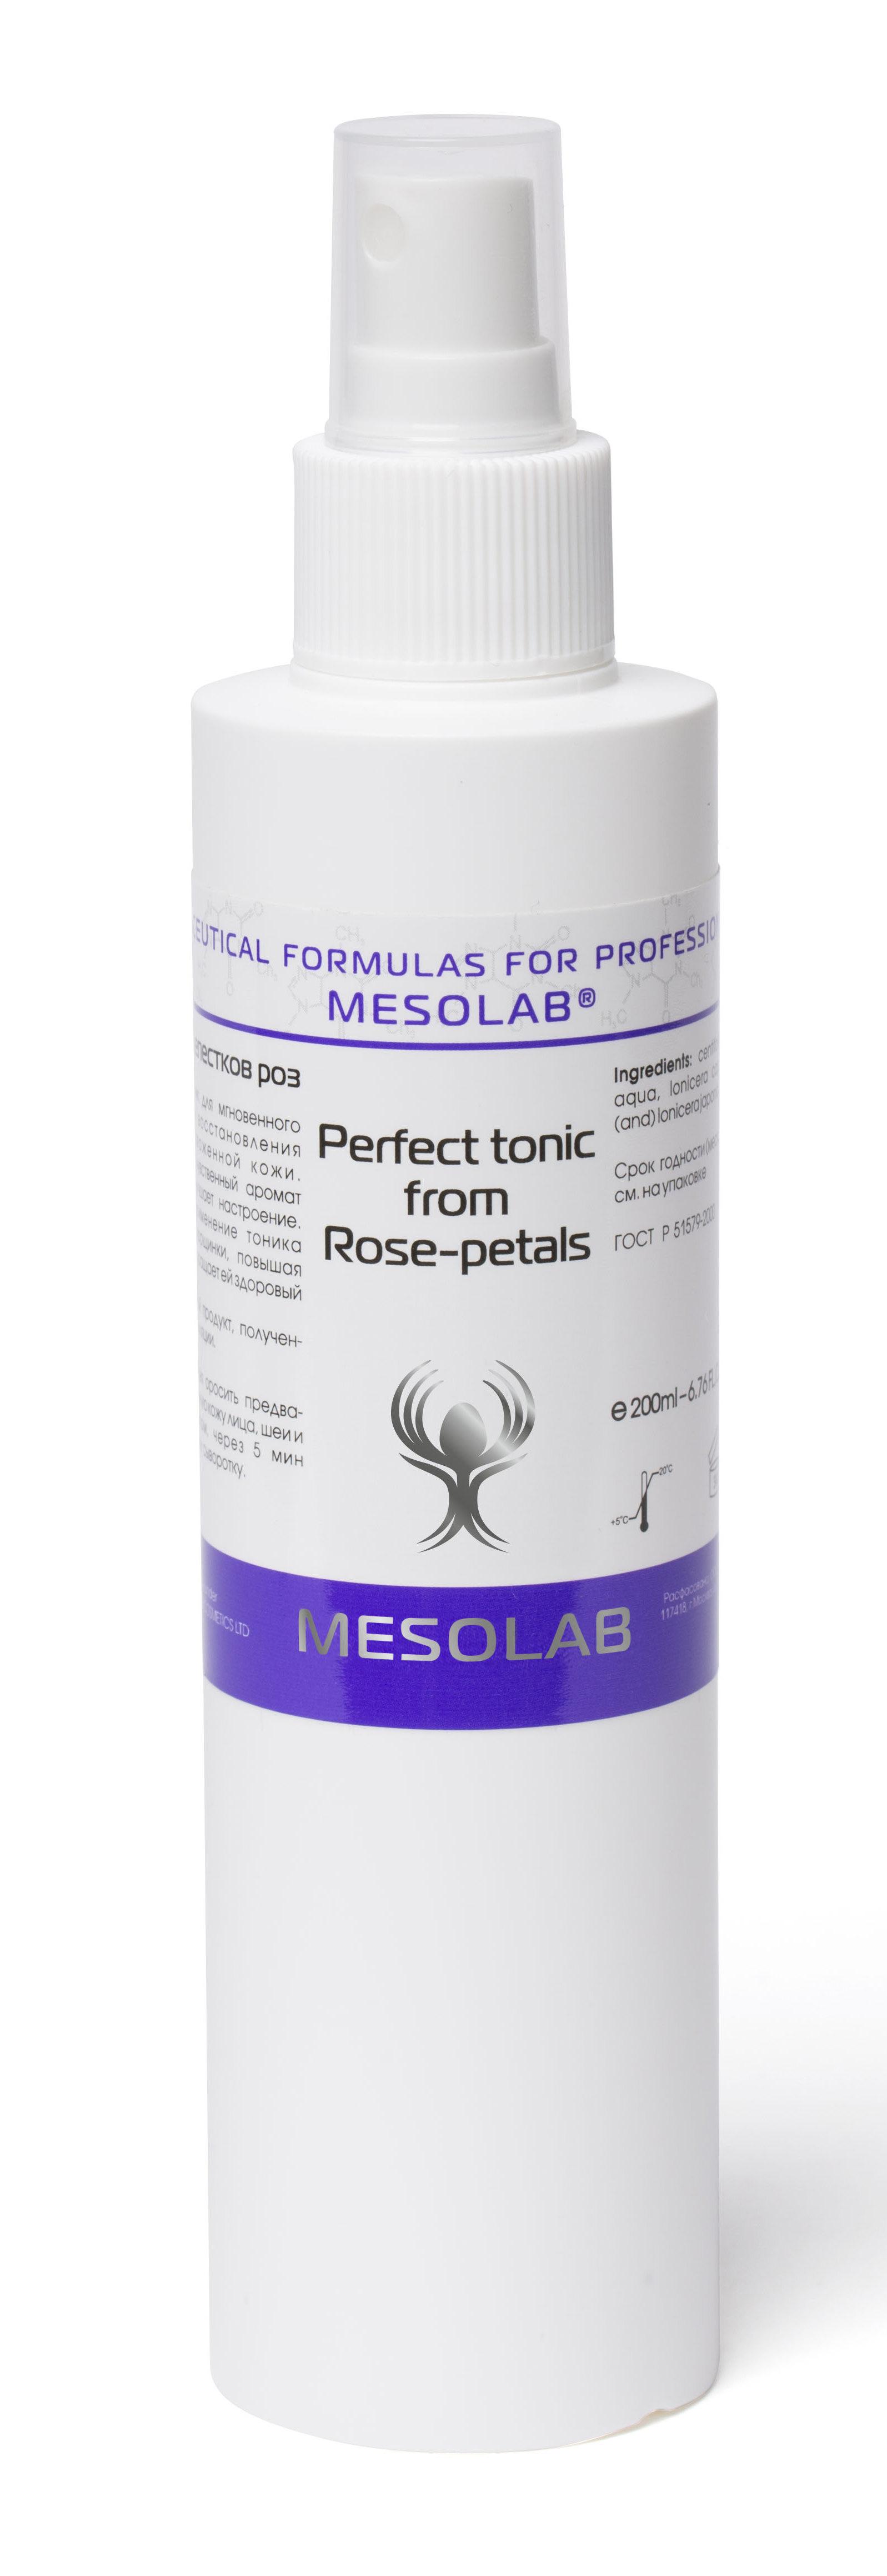 MESOLAB Тоник из лепестков роз / PERFECT TONIC FROM ROSE-PETALS 200 мл -  Тоники